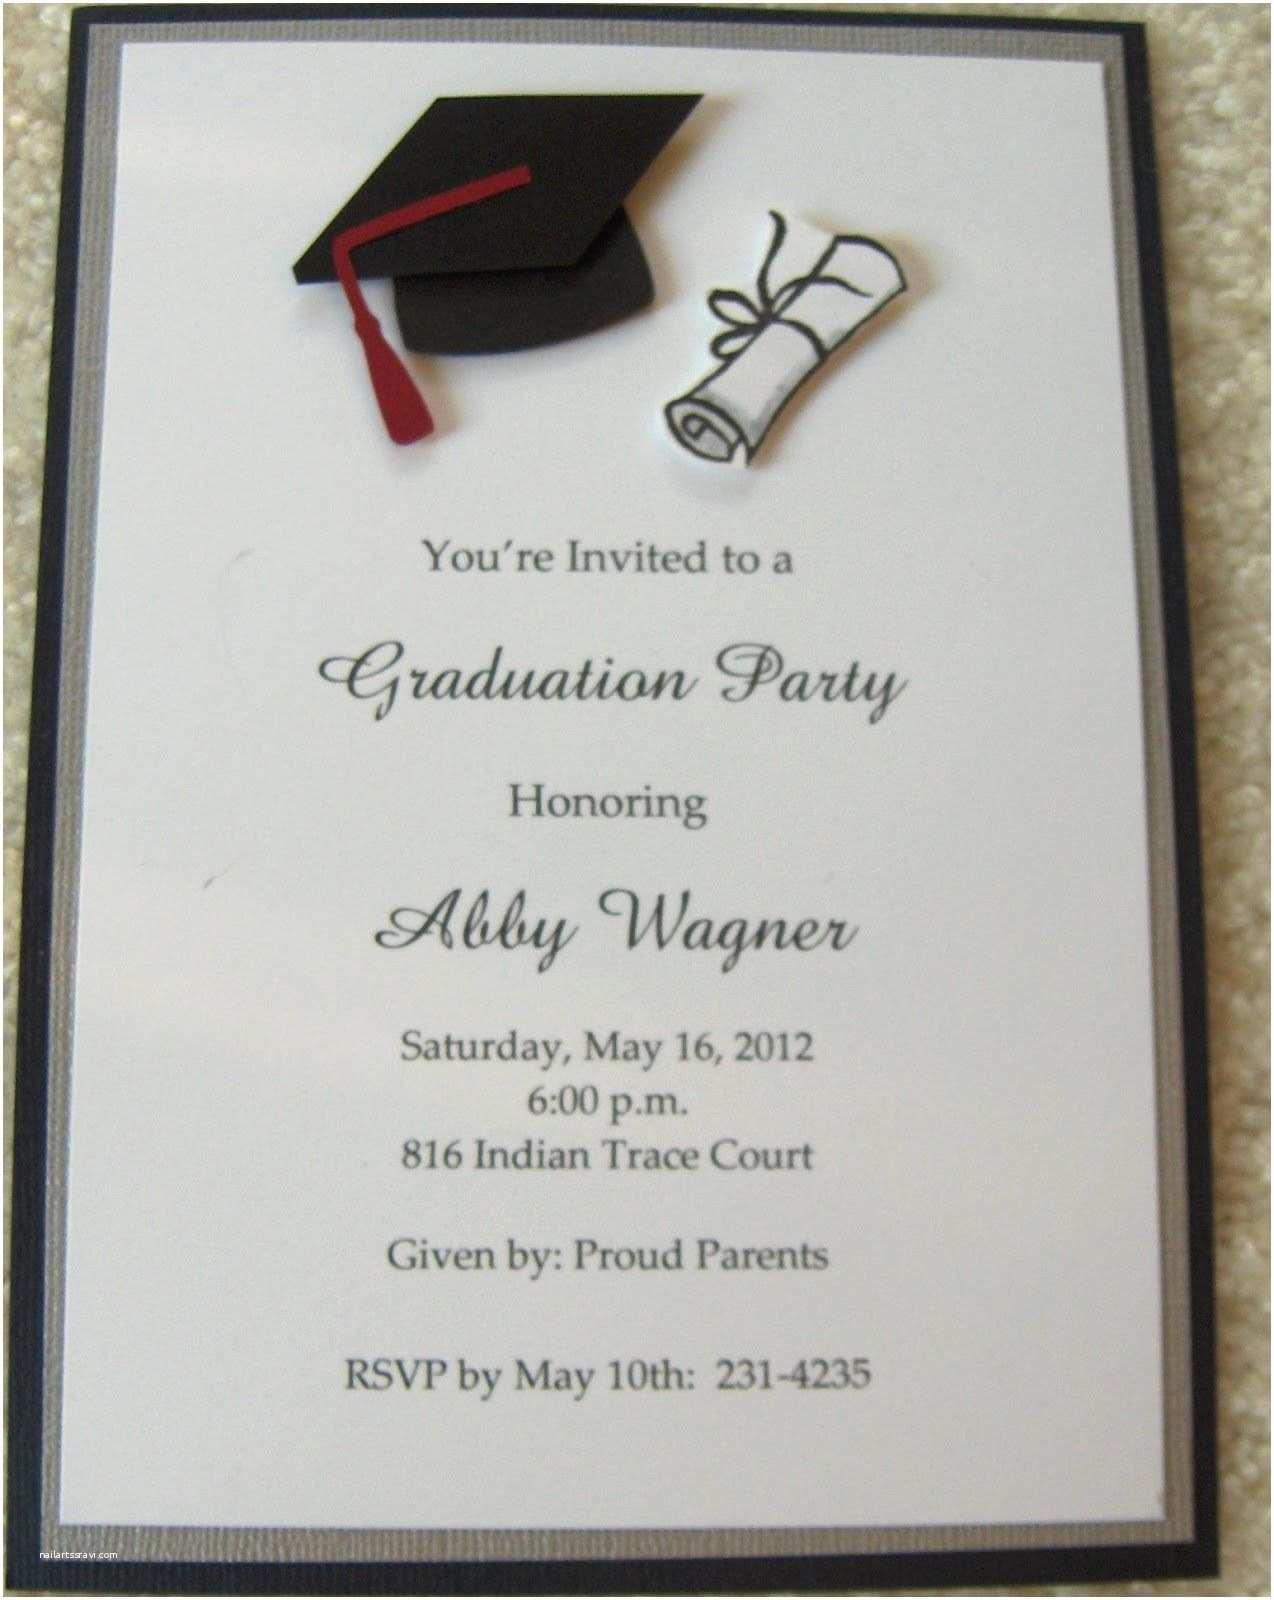 Graduation Party Invitations Templates Graduation Invitations Google Search